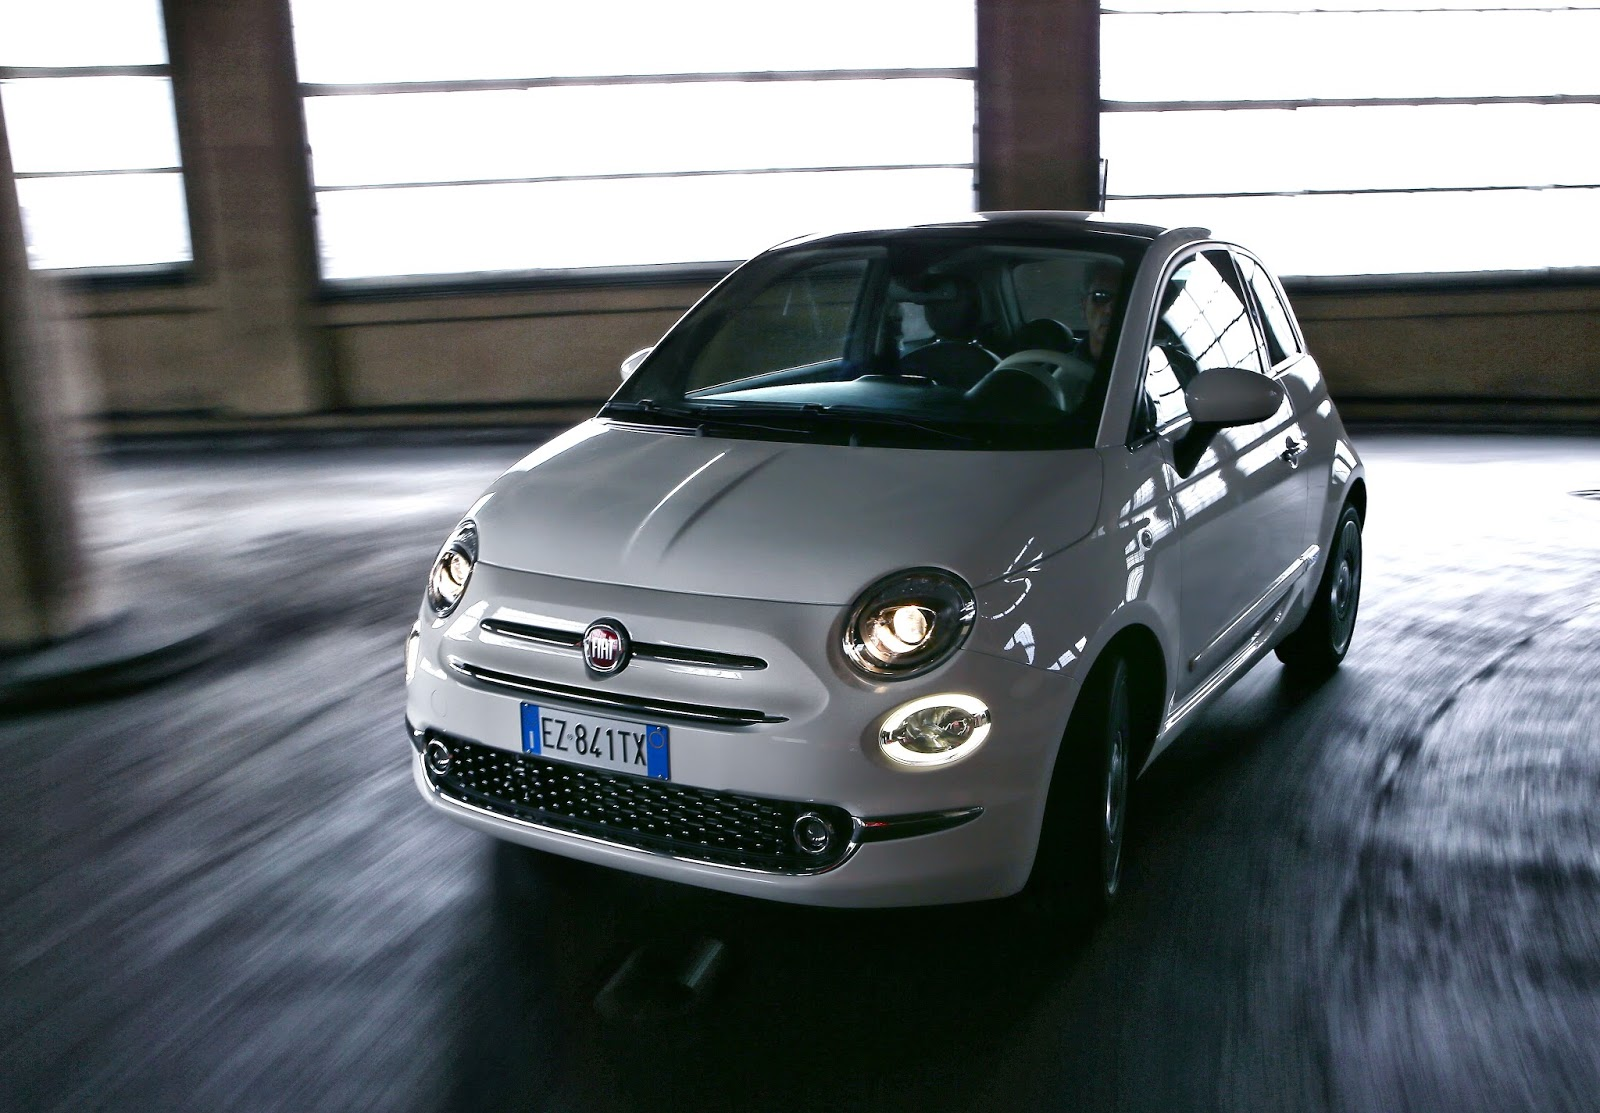 150703 FIAT Nuova 500 15 Η άφιξη του νέου Fiat 500 είναι γεγονός